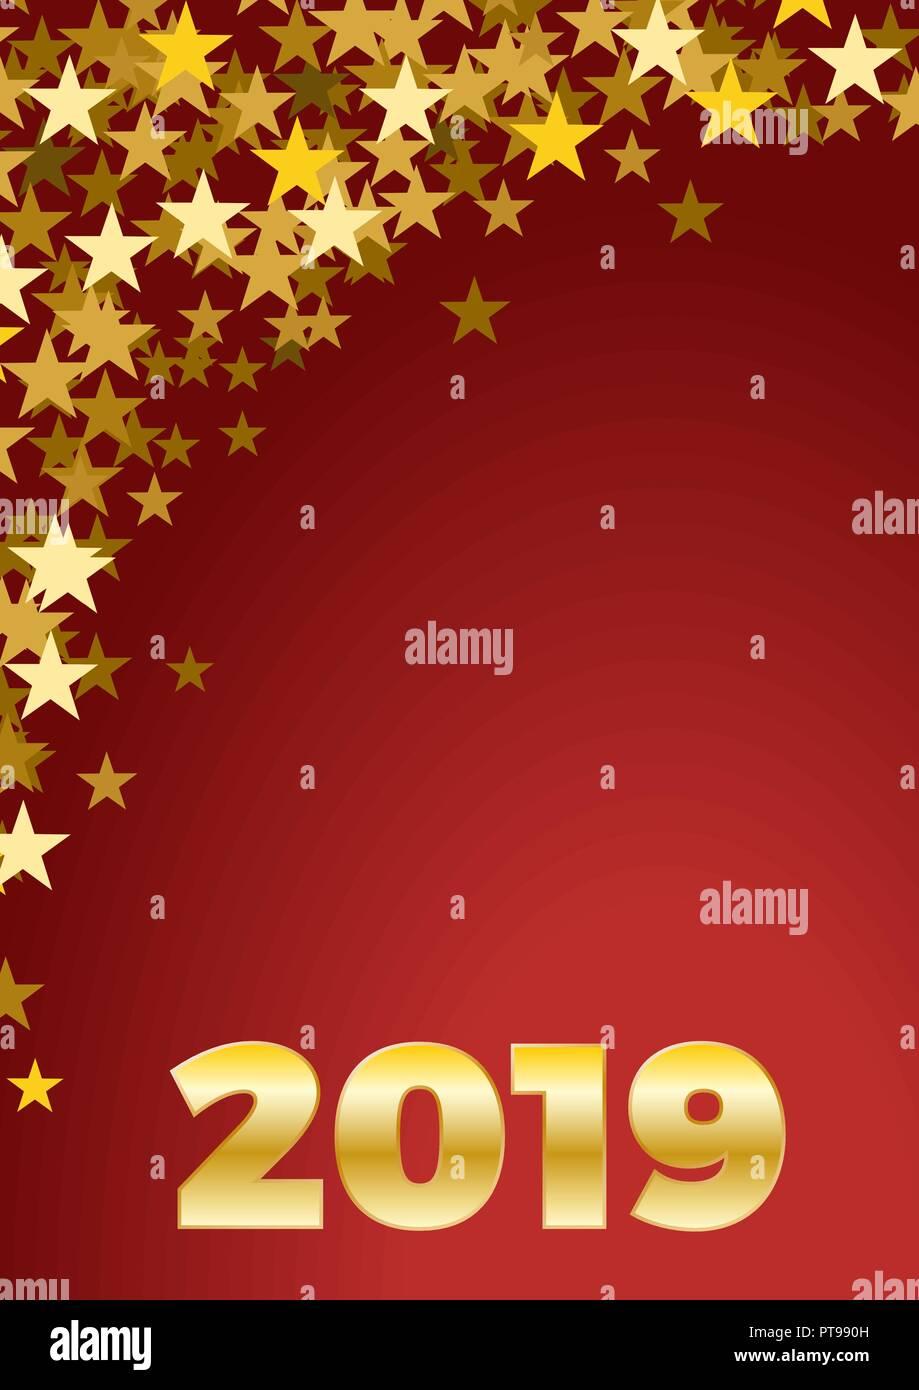 wish happy new year 2019